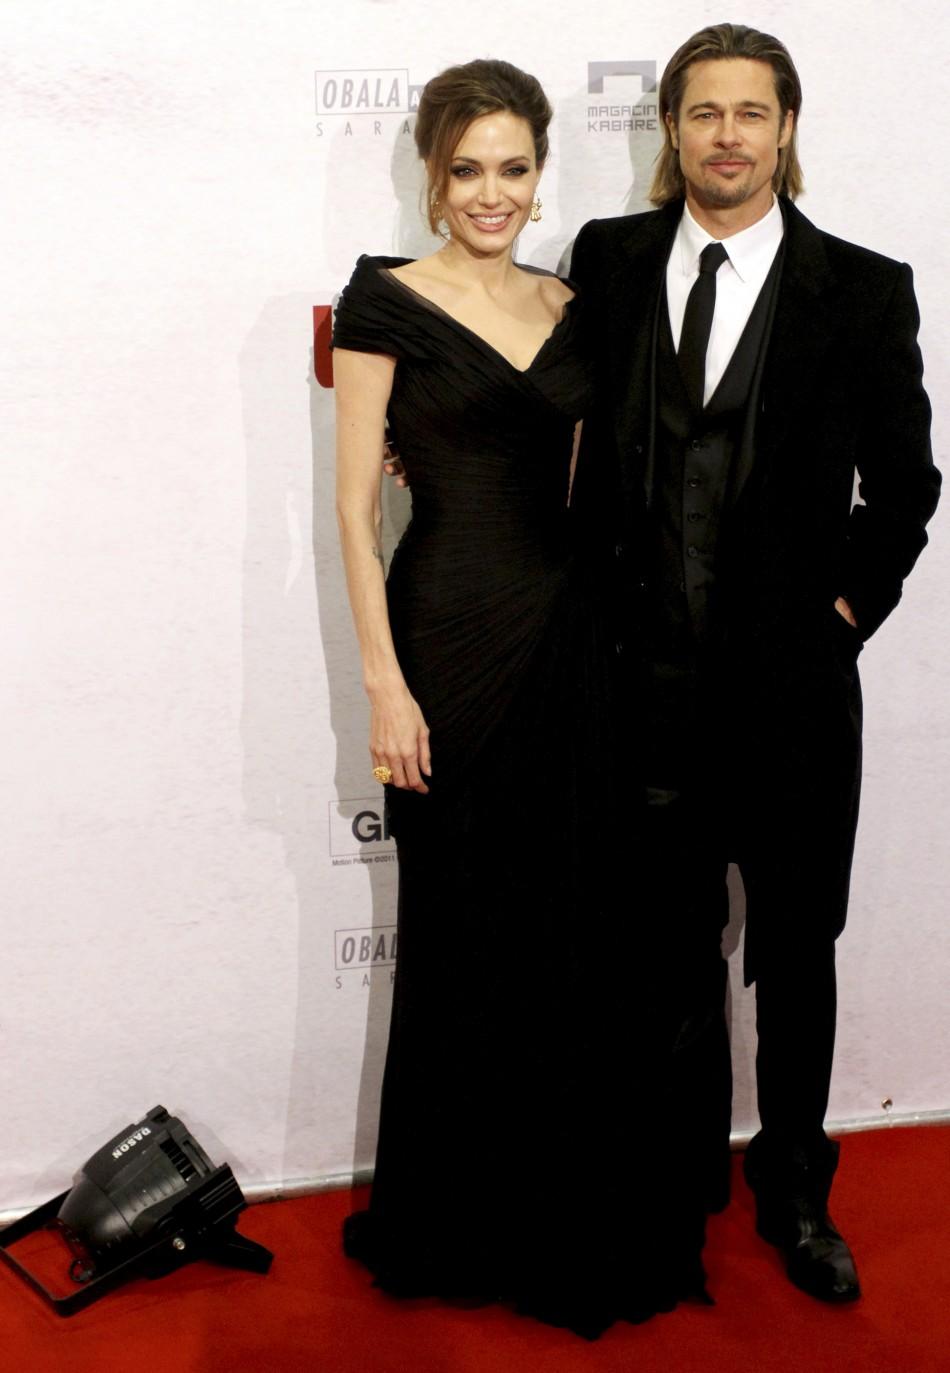 U.S. actress and director Angelina Jolie